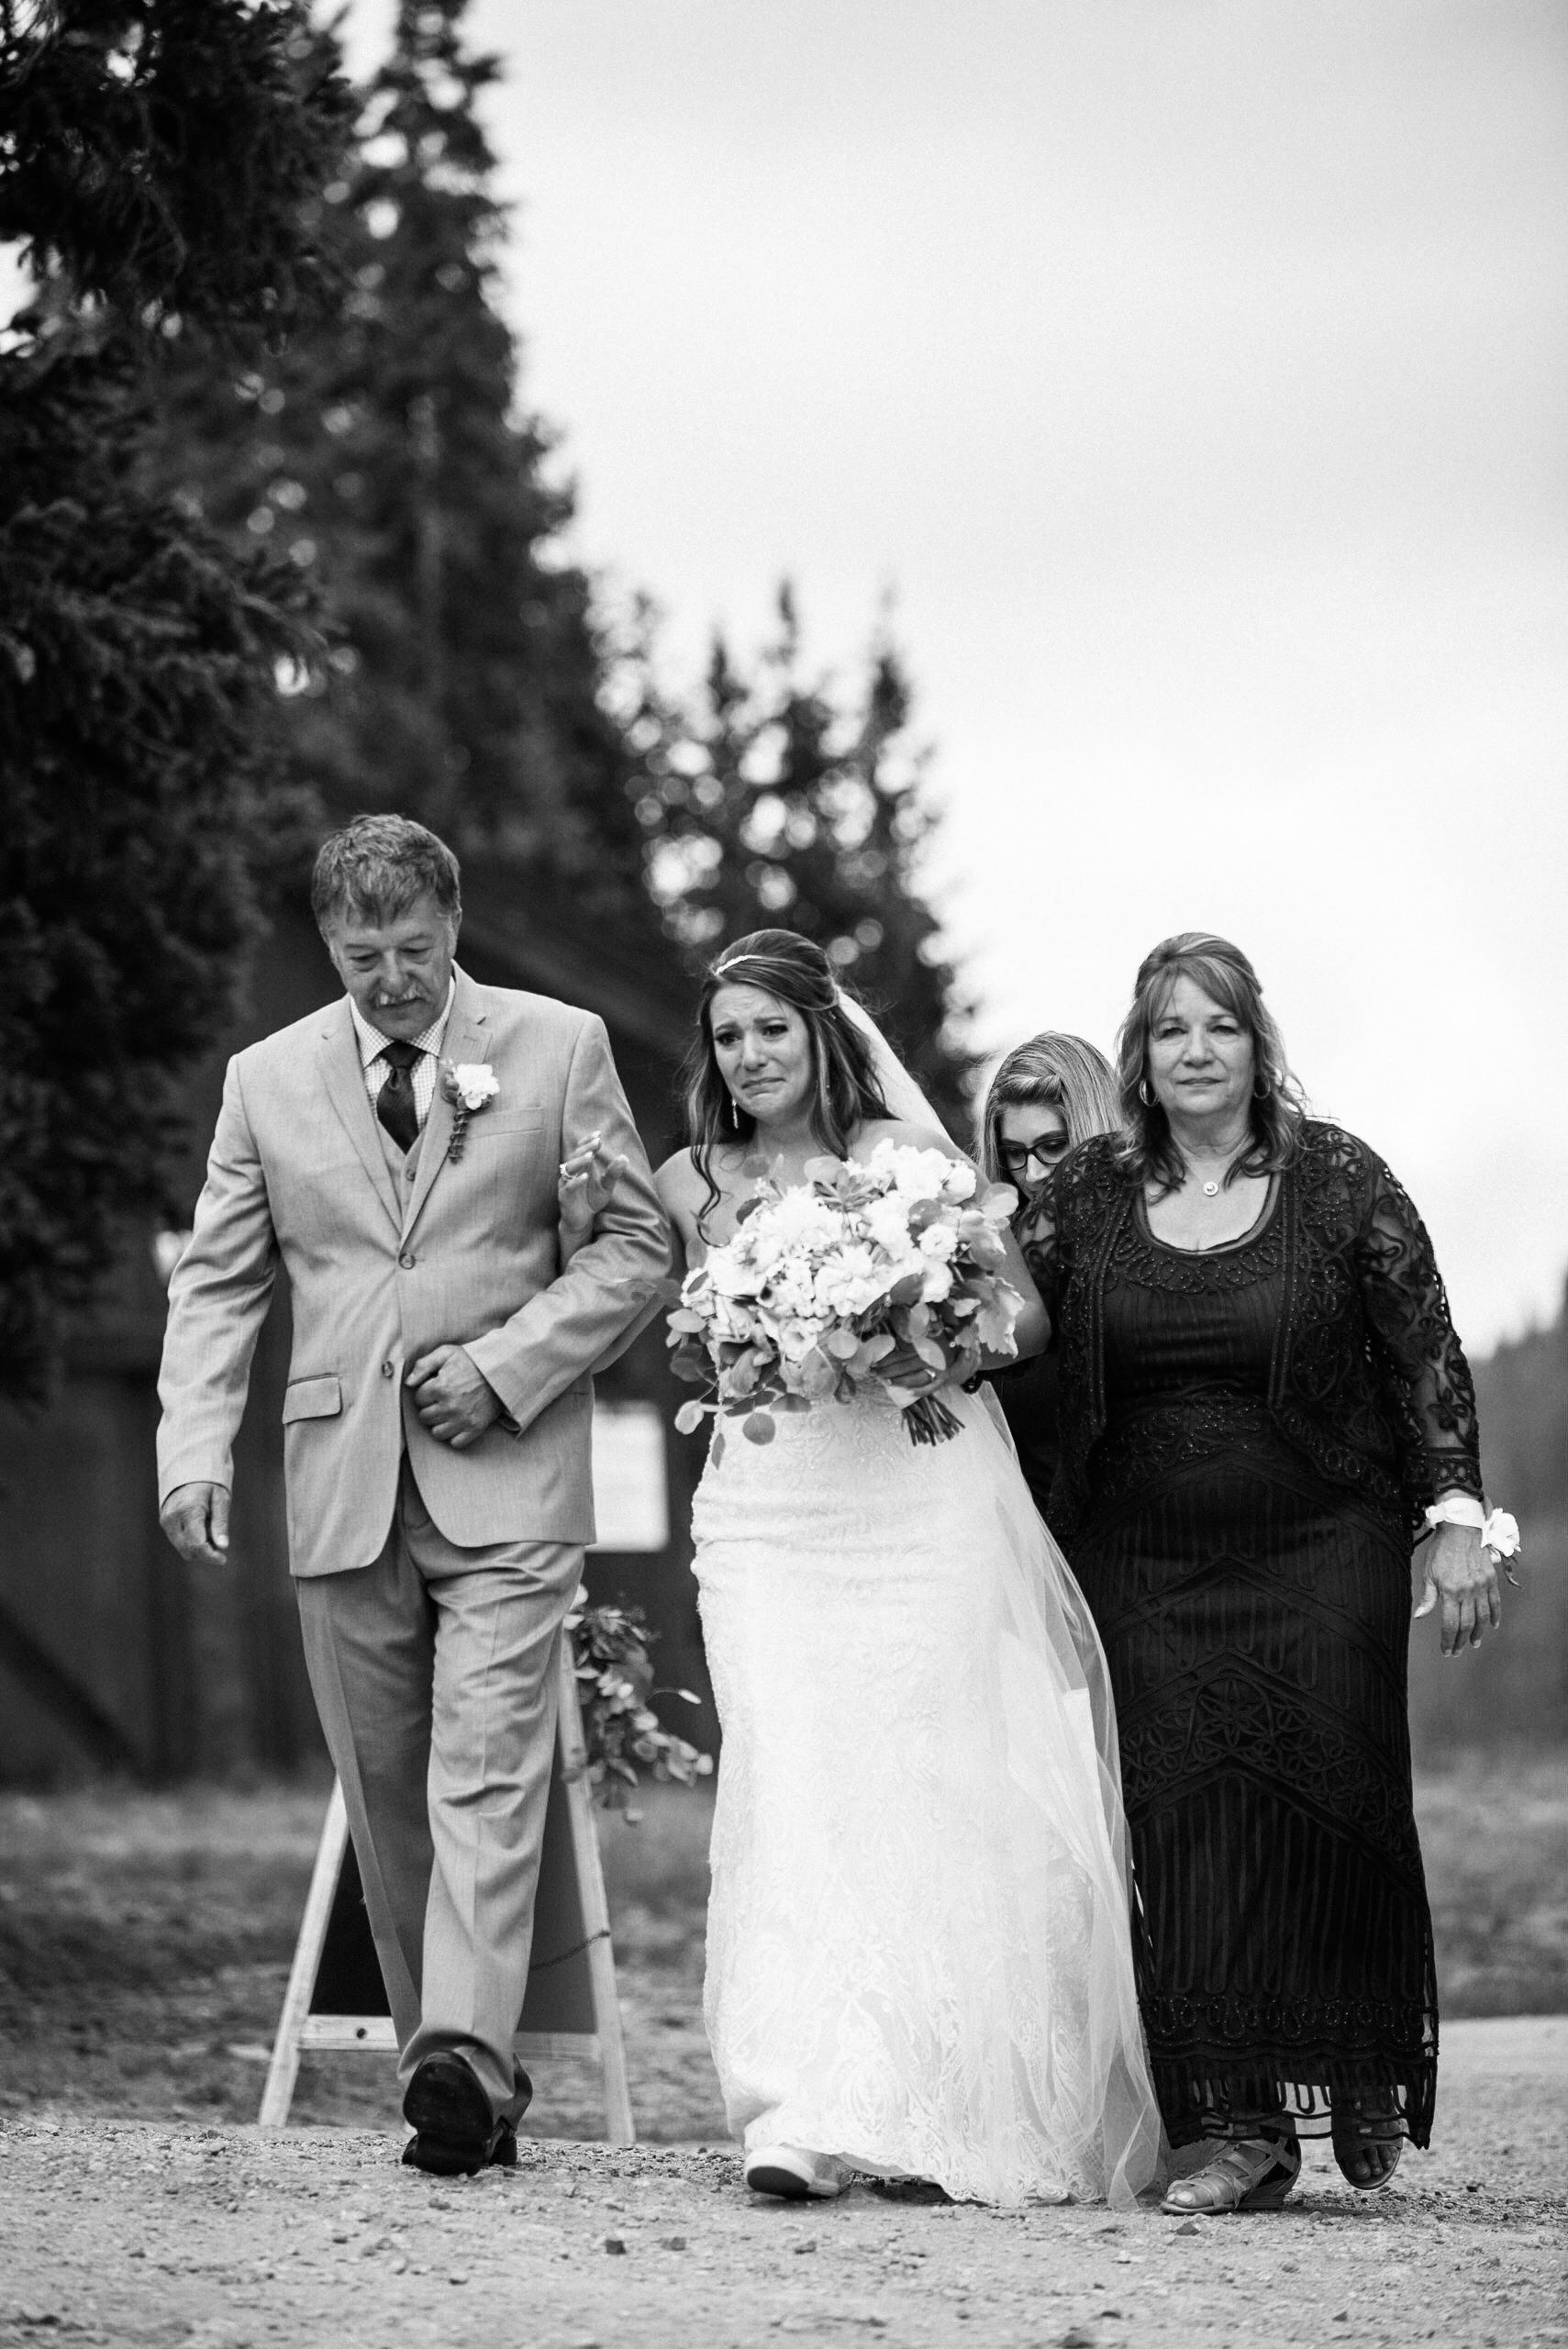 Bride and parents walking down aisle at Keystone, Colorado mountain wedding